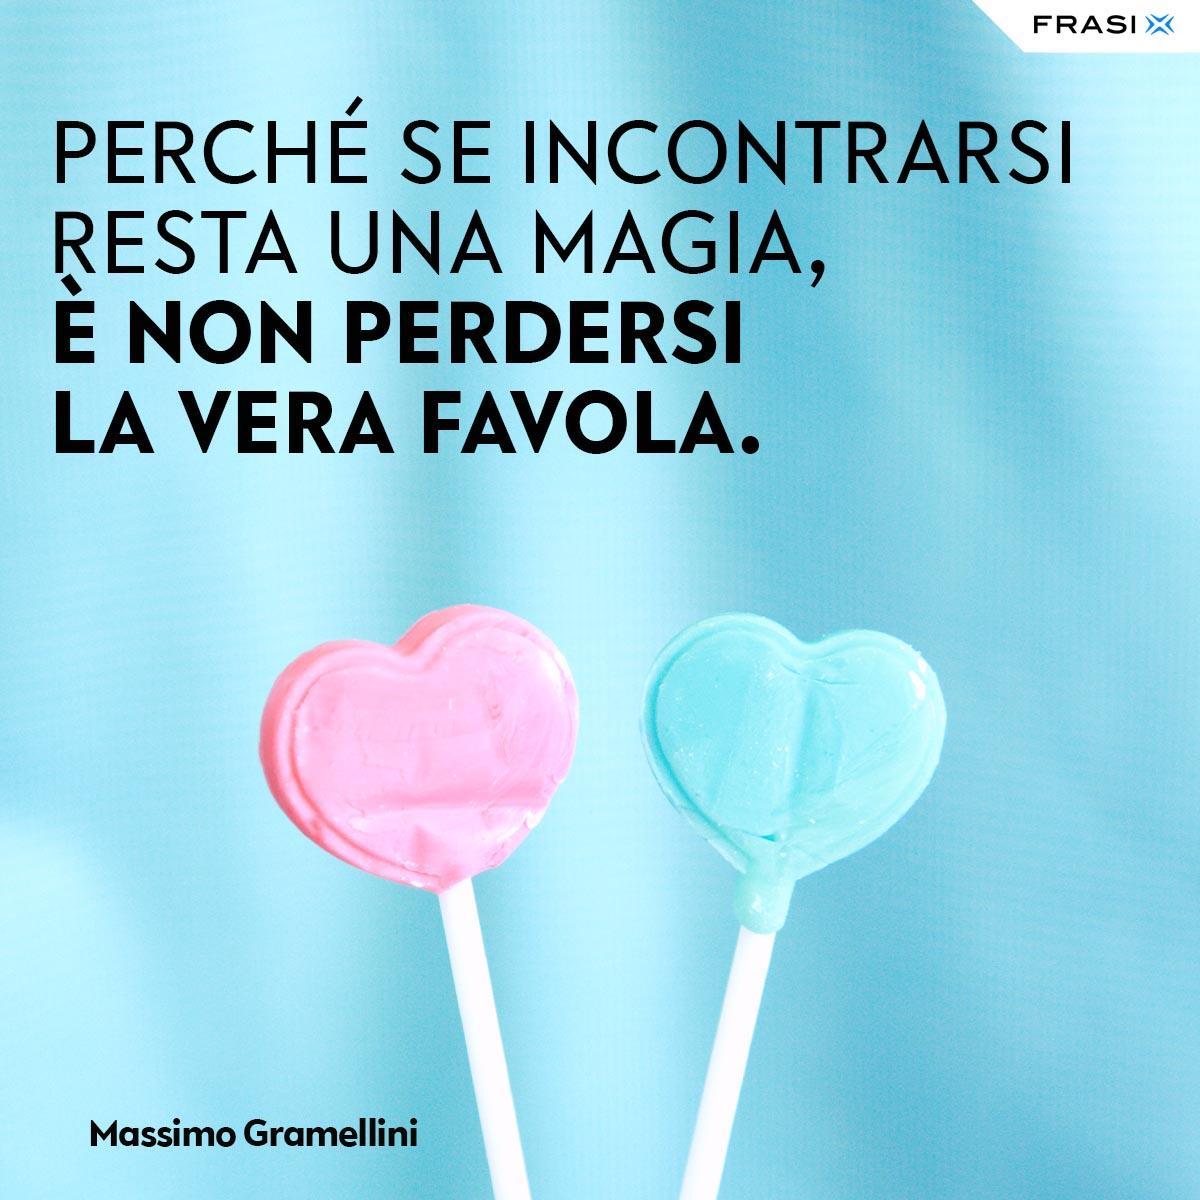 Frasi tumblr Massimo Gramellini